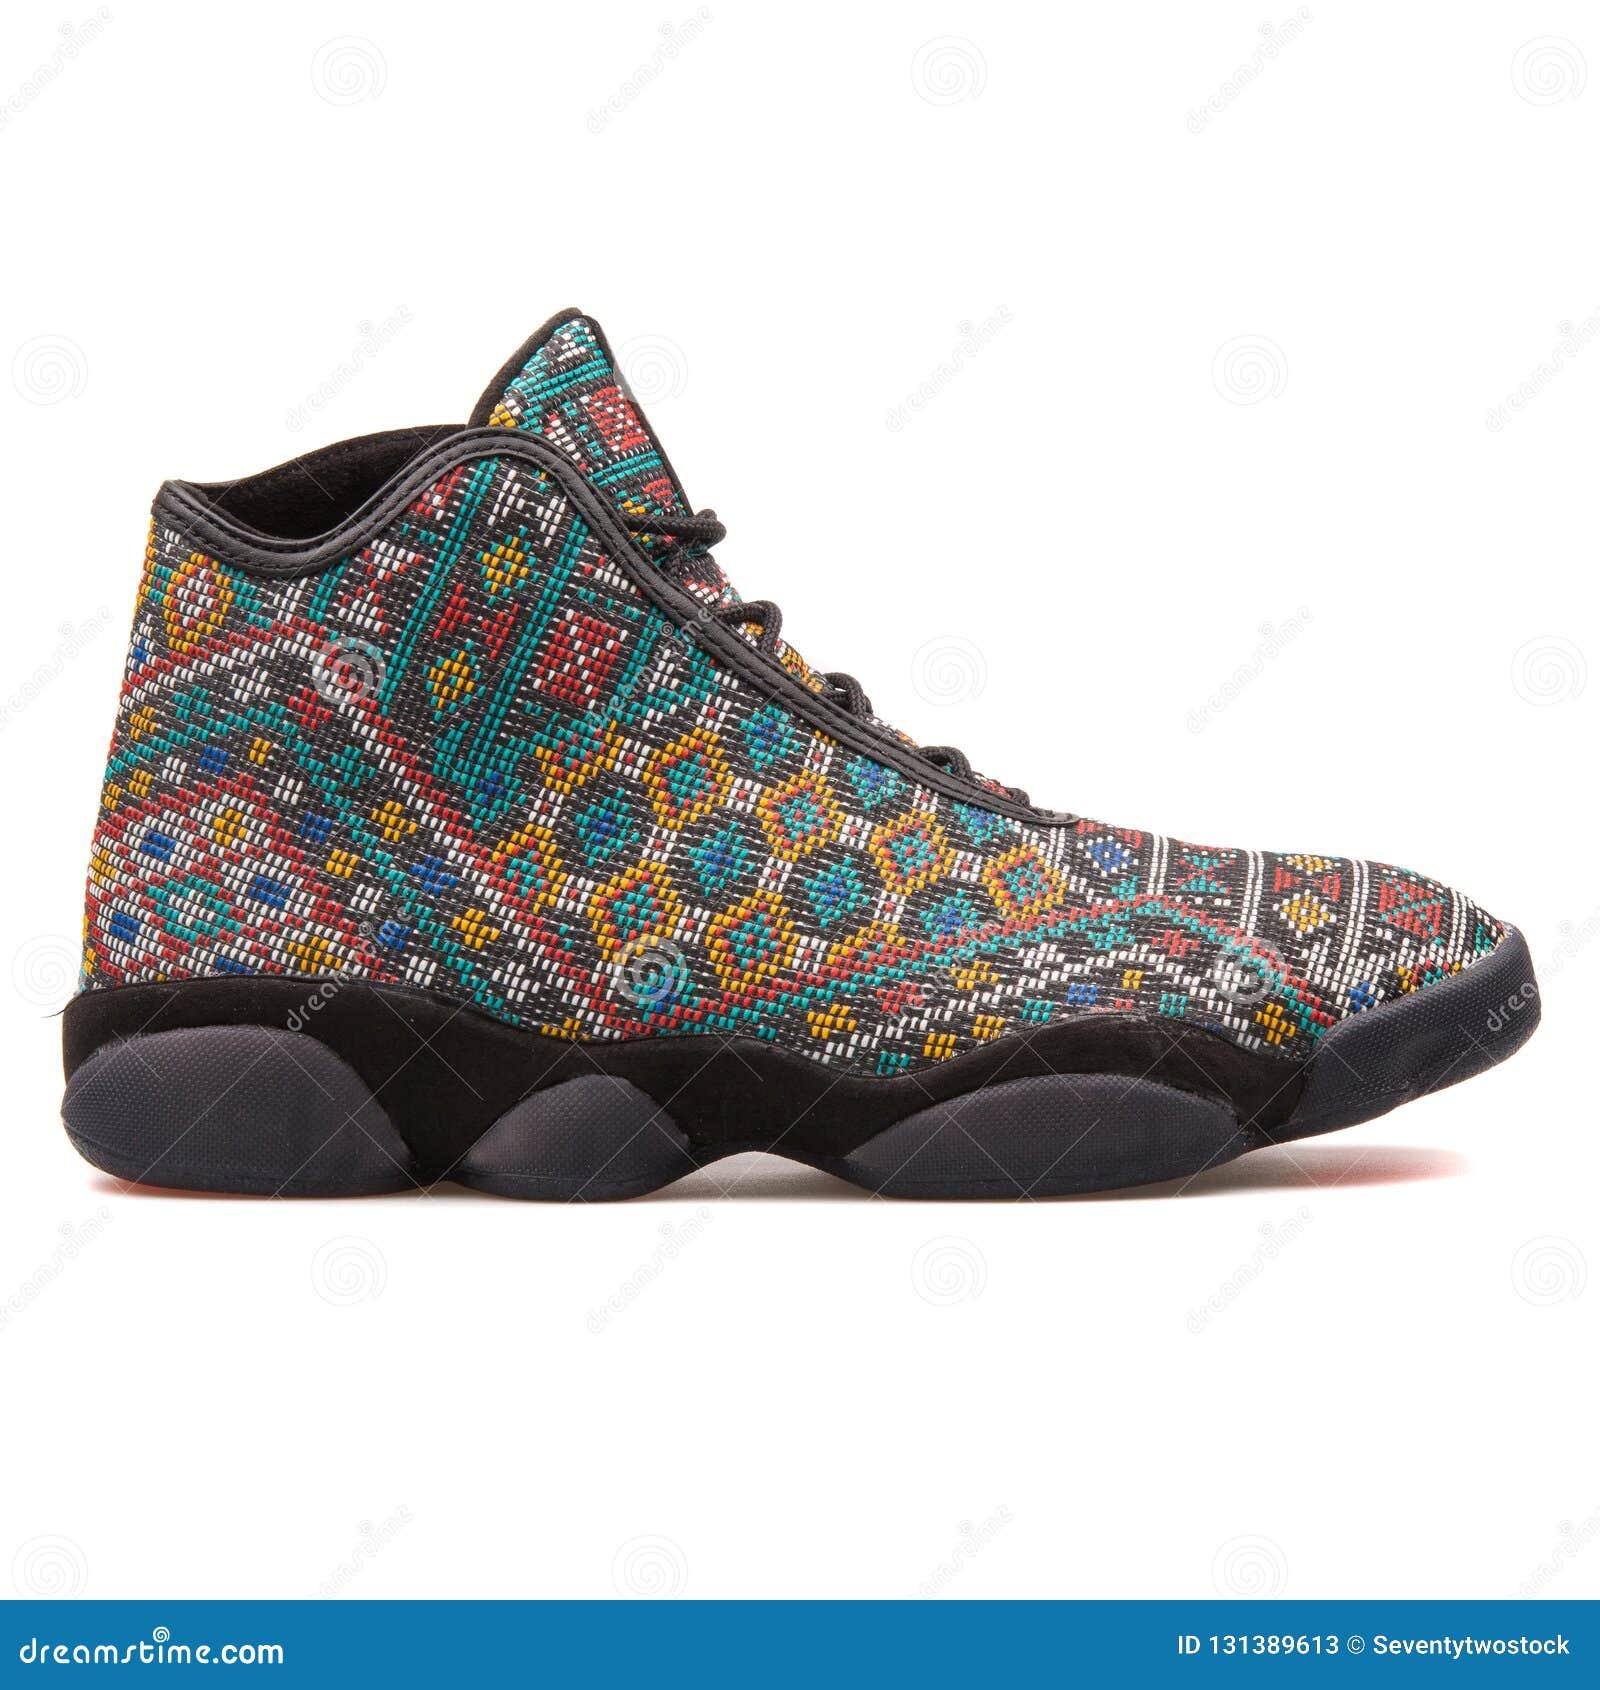 Nike Air Jordan 13 Horizon Premium sneaker isolated on white background 3ba4c9ce1